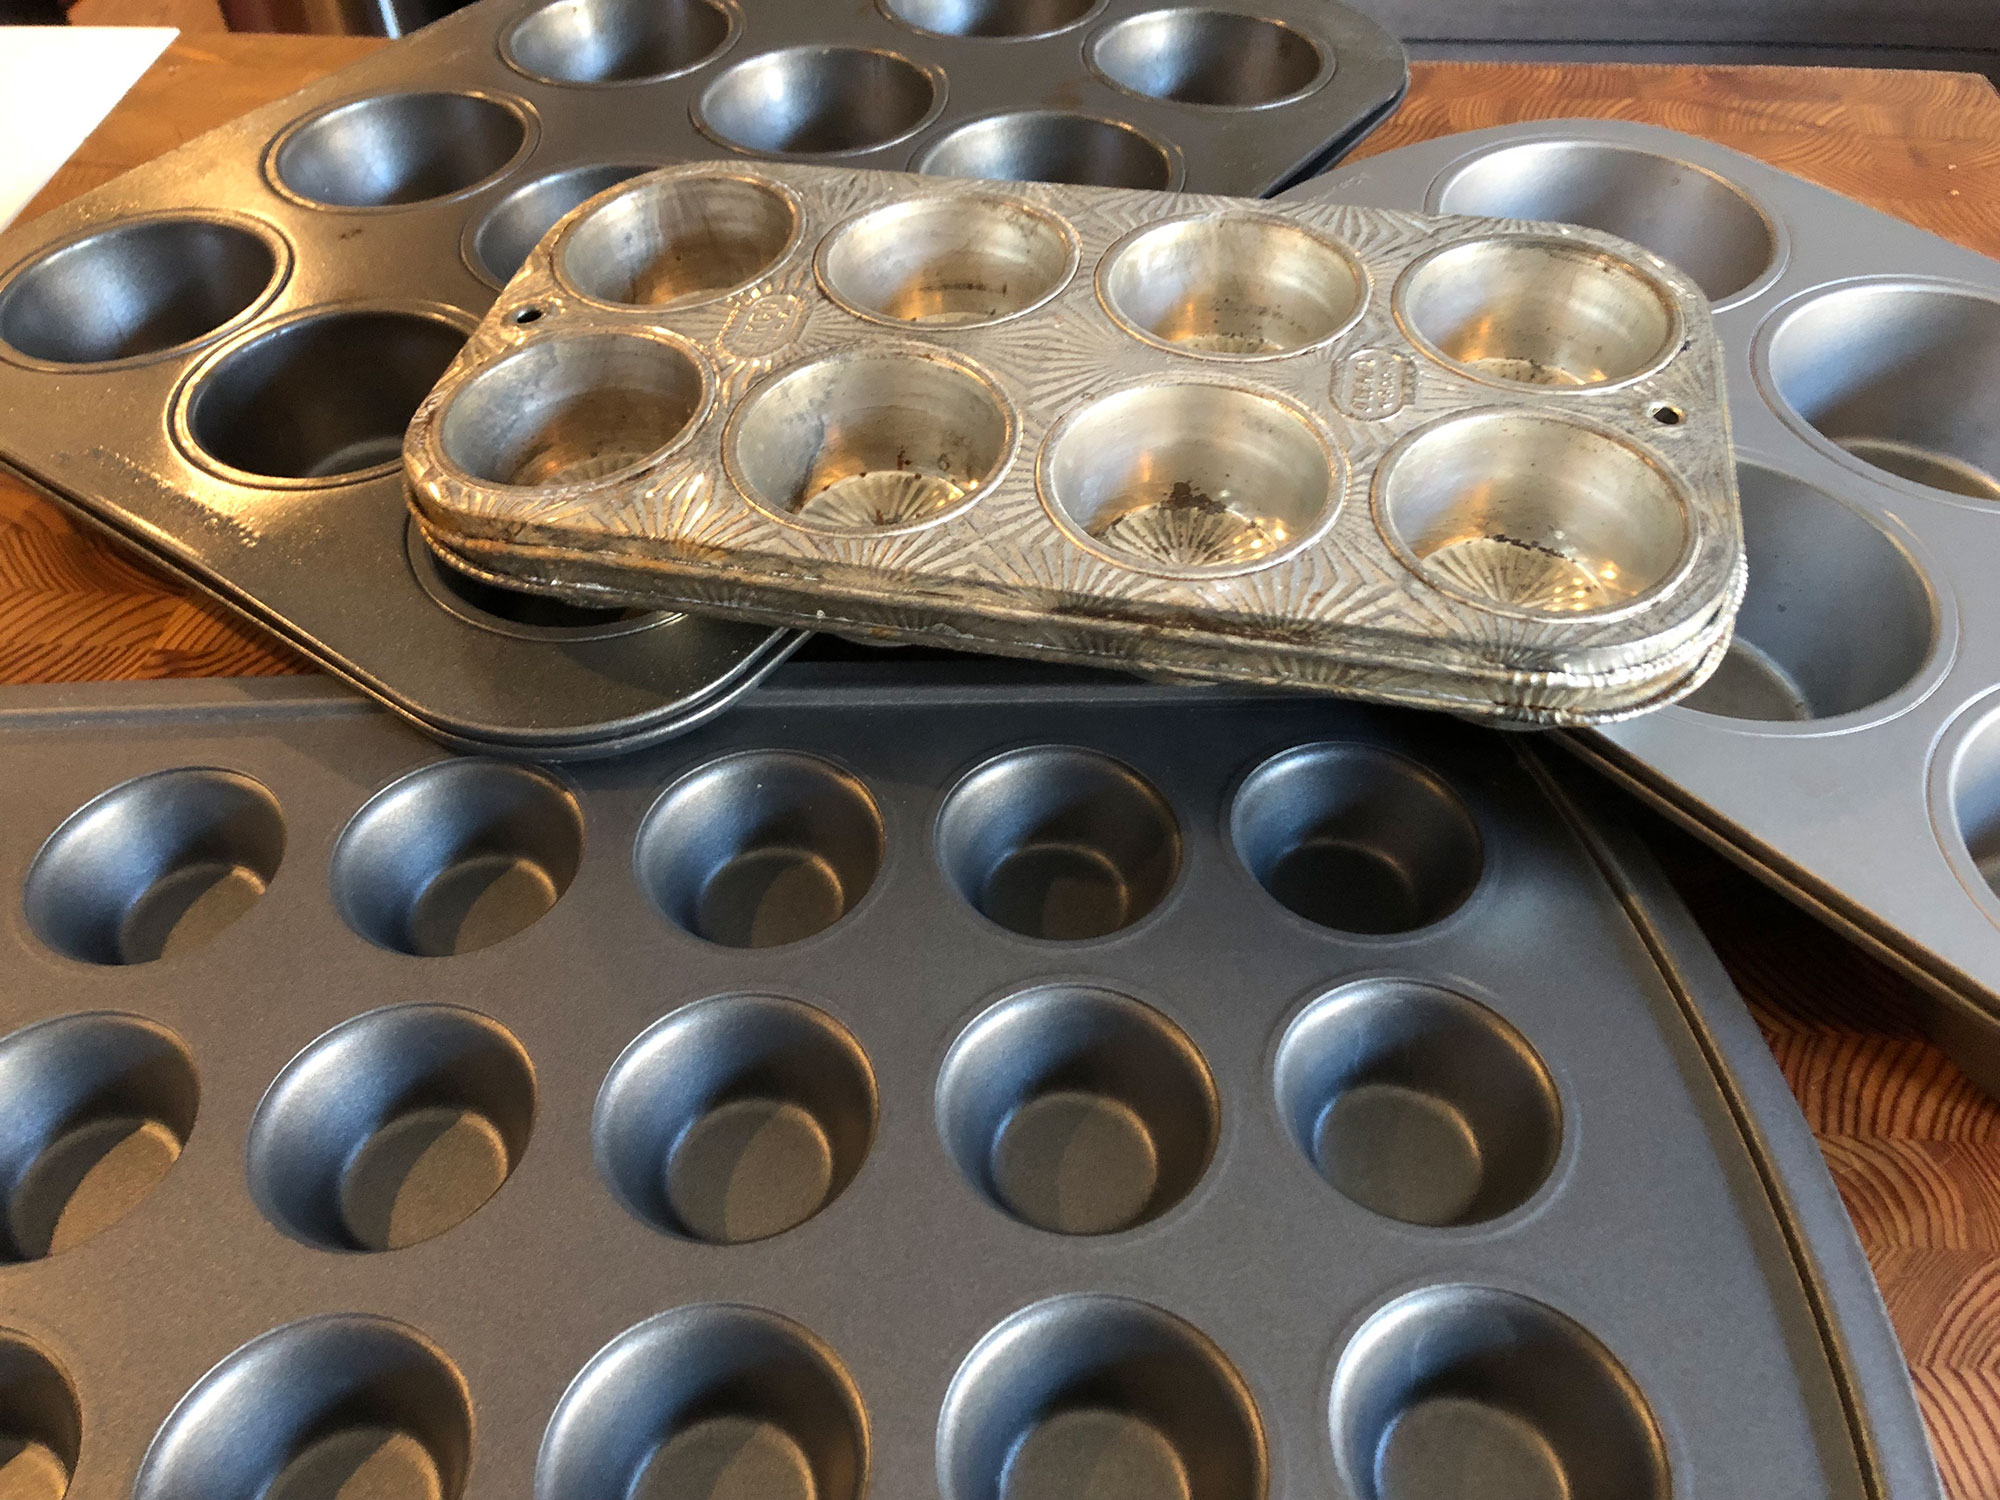 muffin-tins.jpg